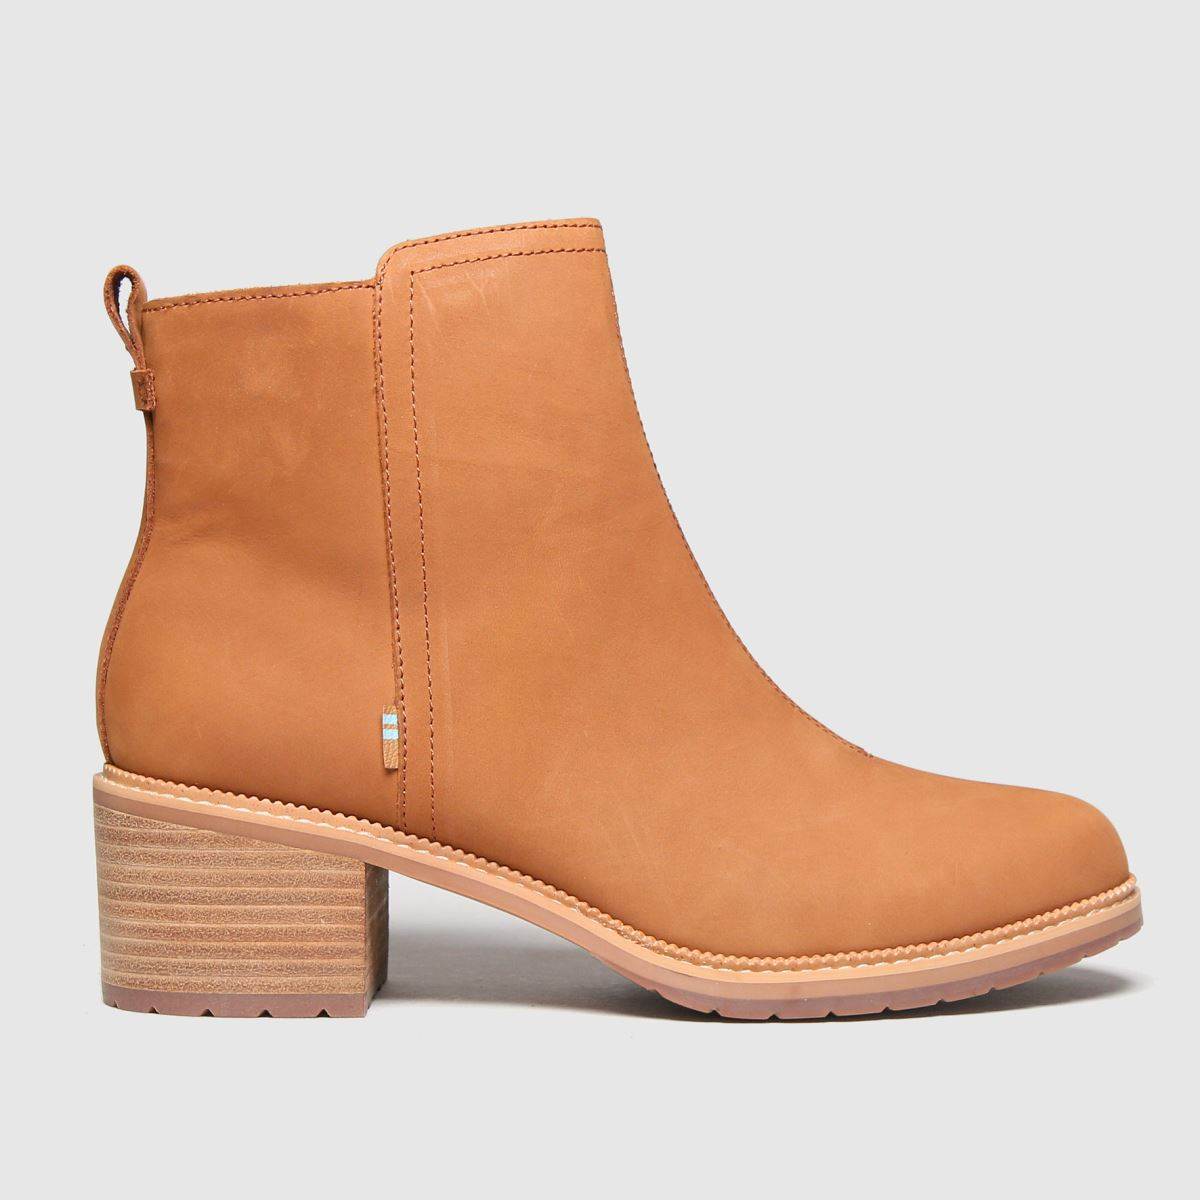 Toms Tan Marina Boots